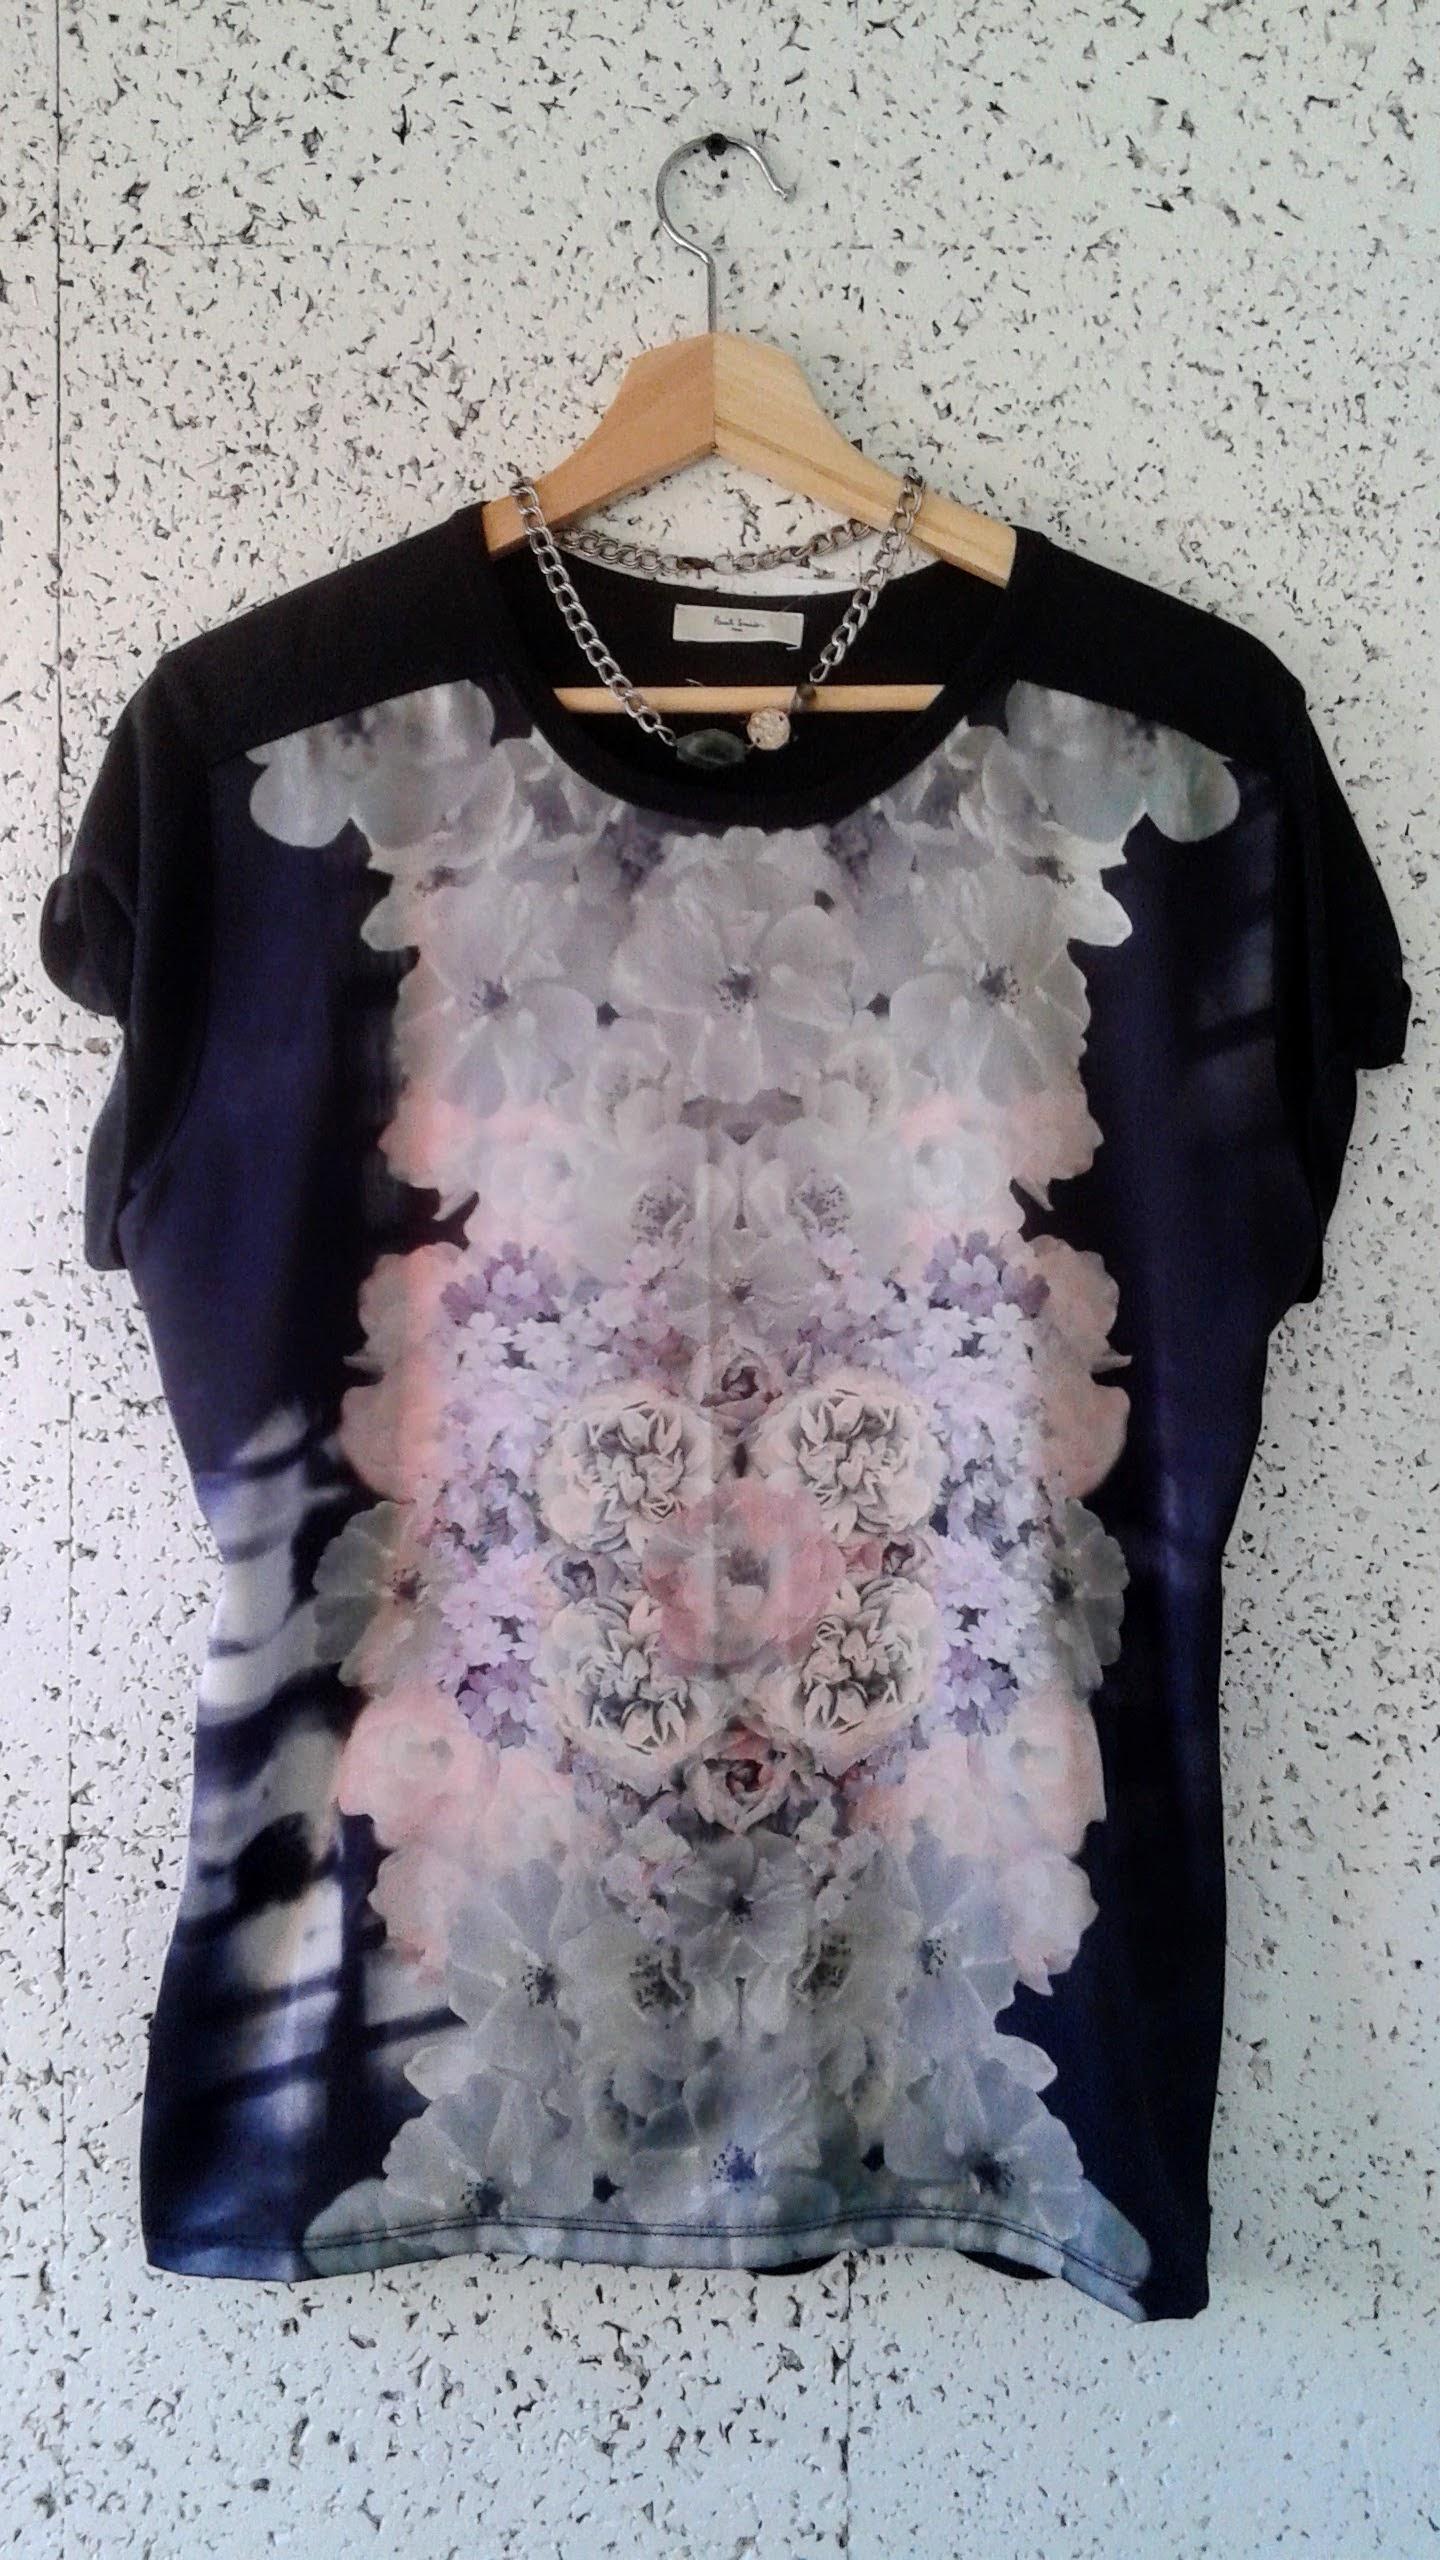 Paul Smith  shirt; Size M, $32. Necklace, $30